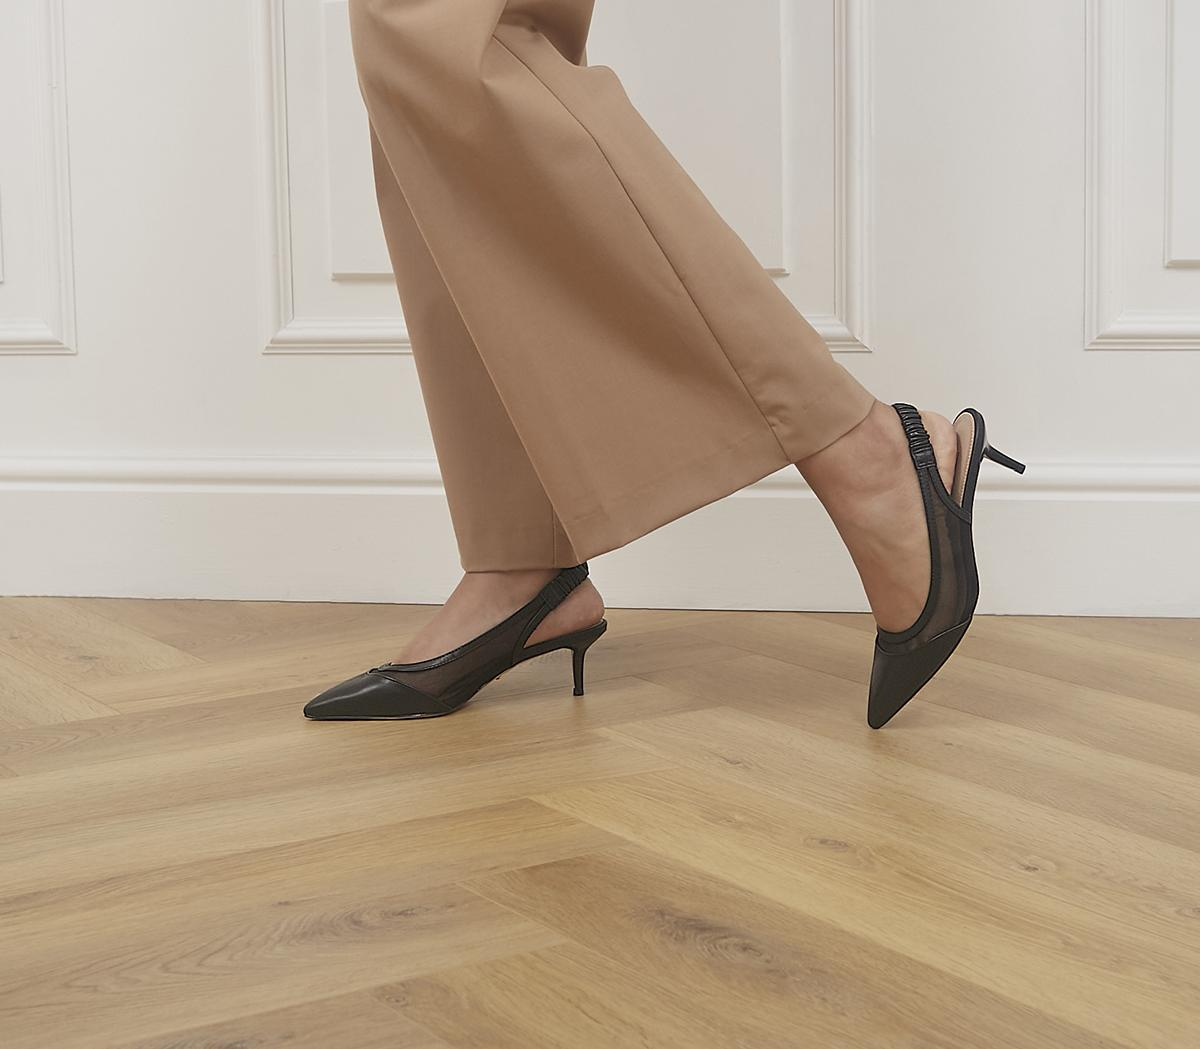 Master's Degree Mesh Point Slingback Heels